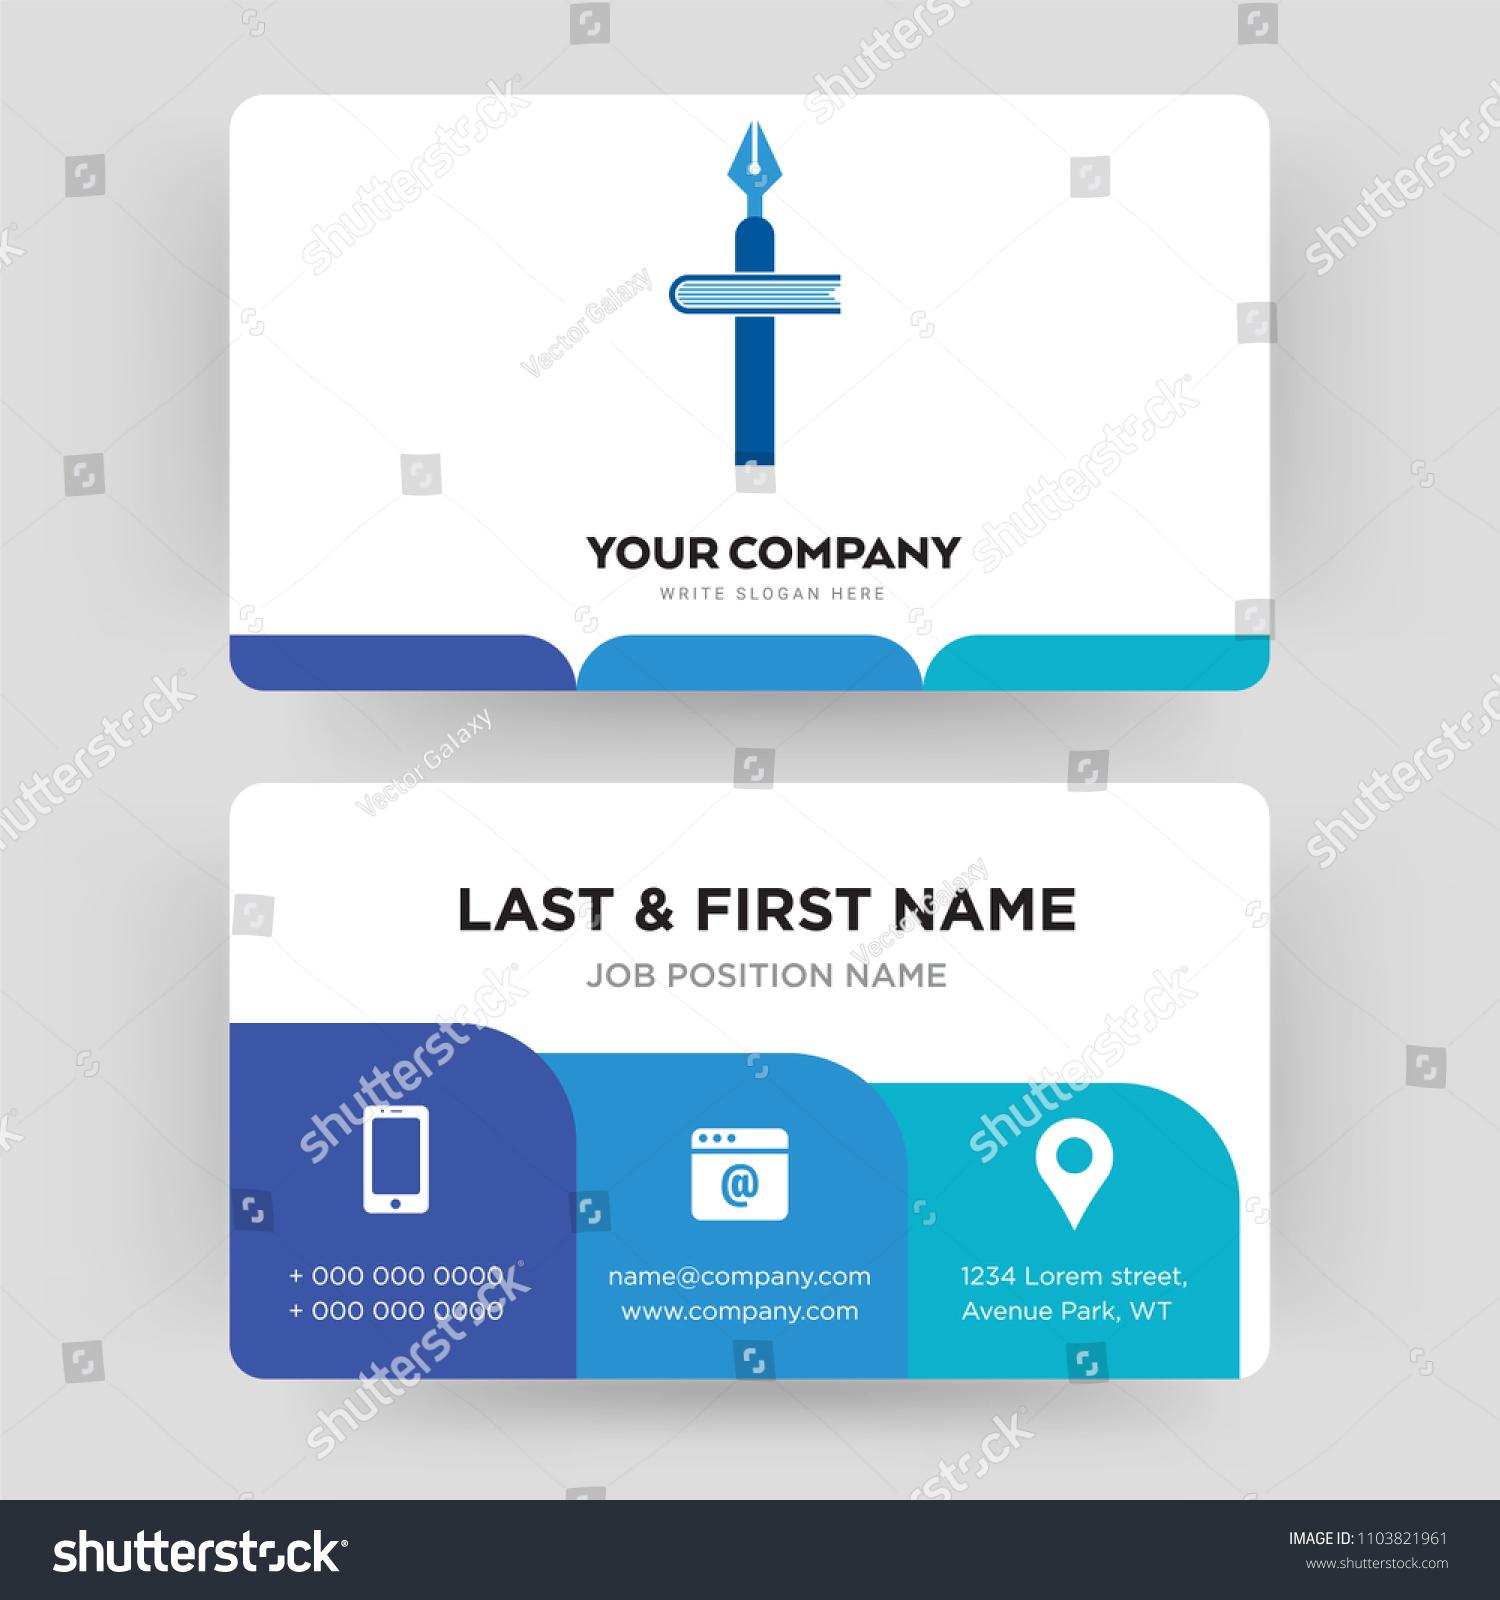 Christian School Business Card Design Template Stock Photo (Photo ...